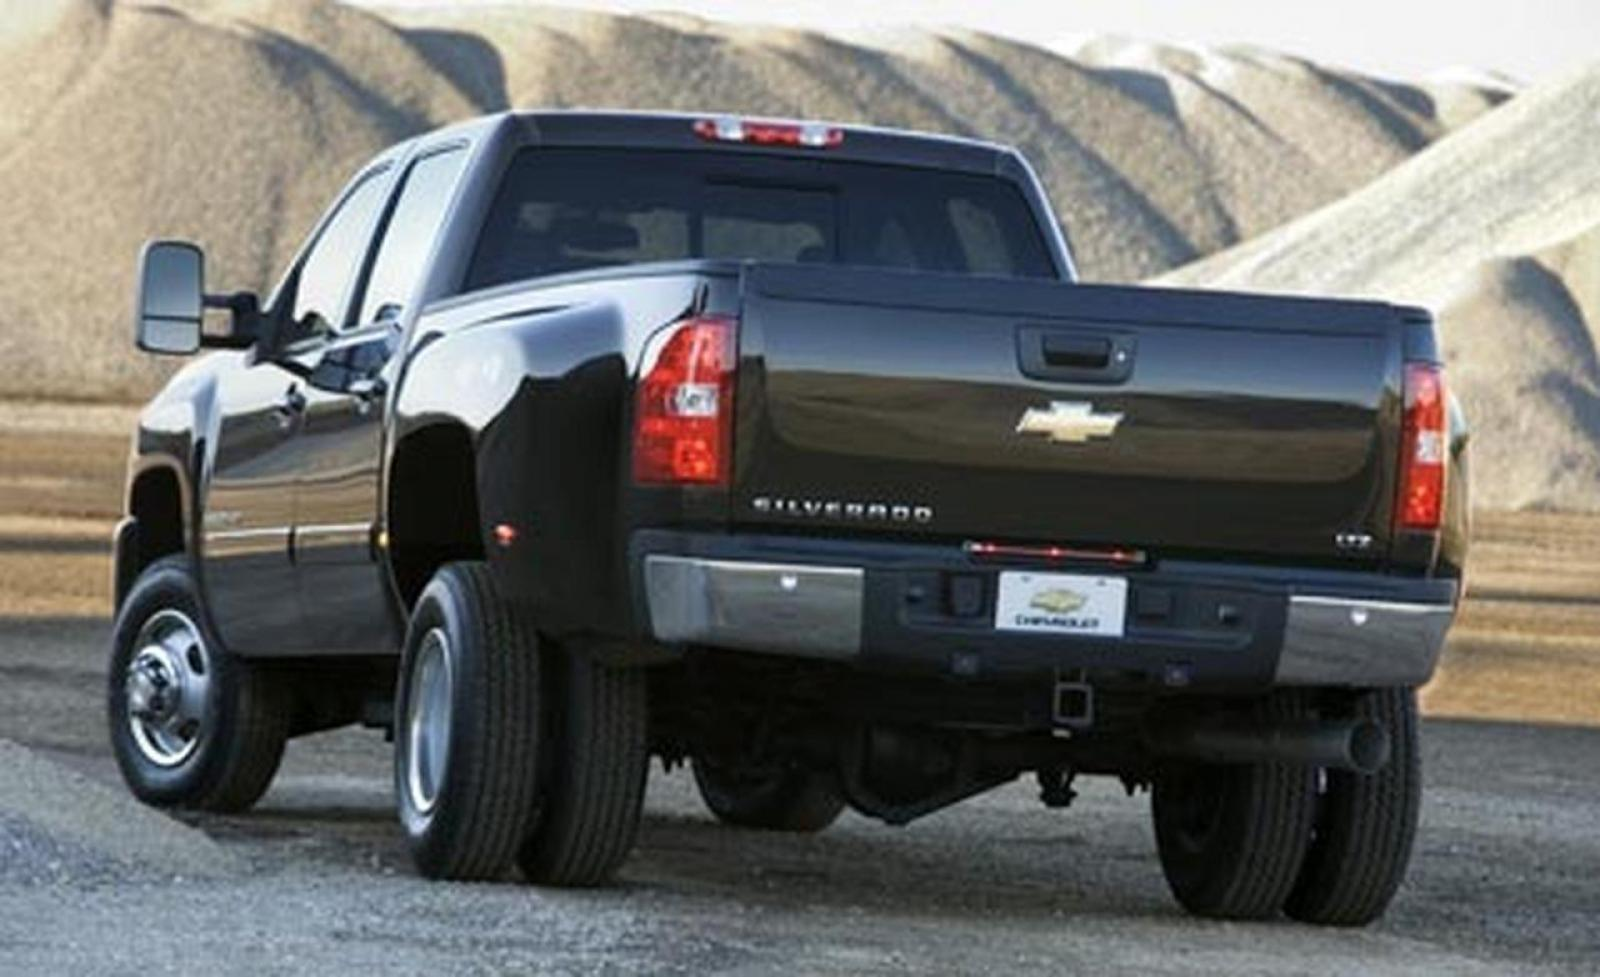 2007 Chevrolet Silverado 3500hd Information And Photos Zombiedrive Wiring Harness 800 1024 1280 1600 Origin